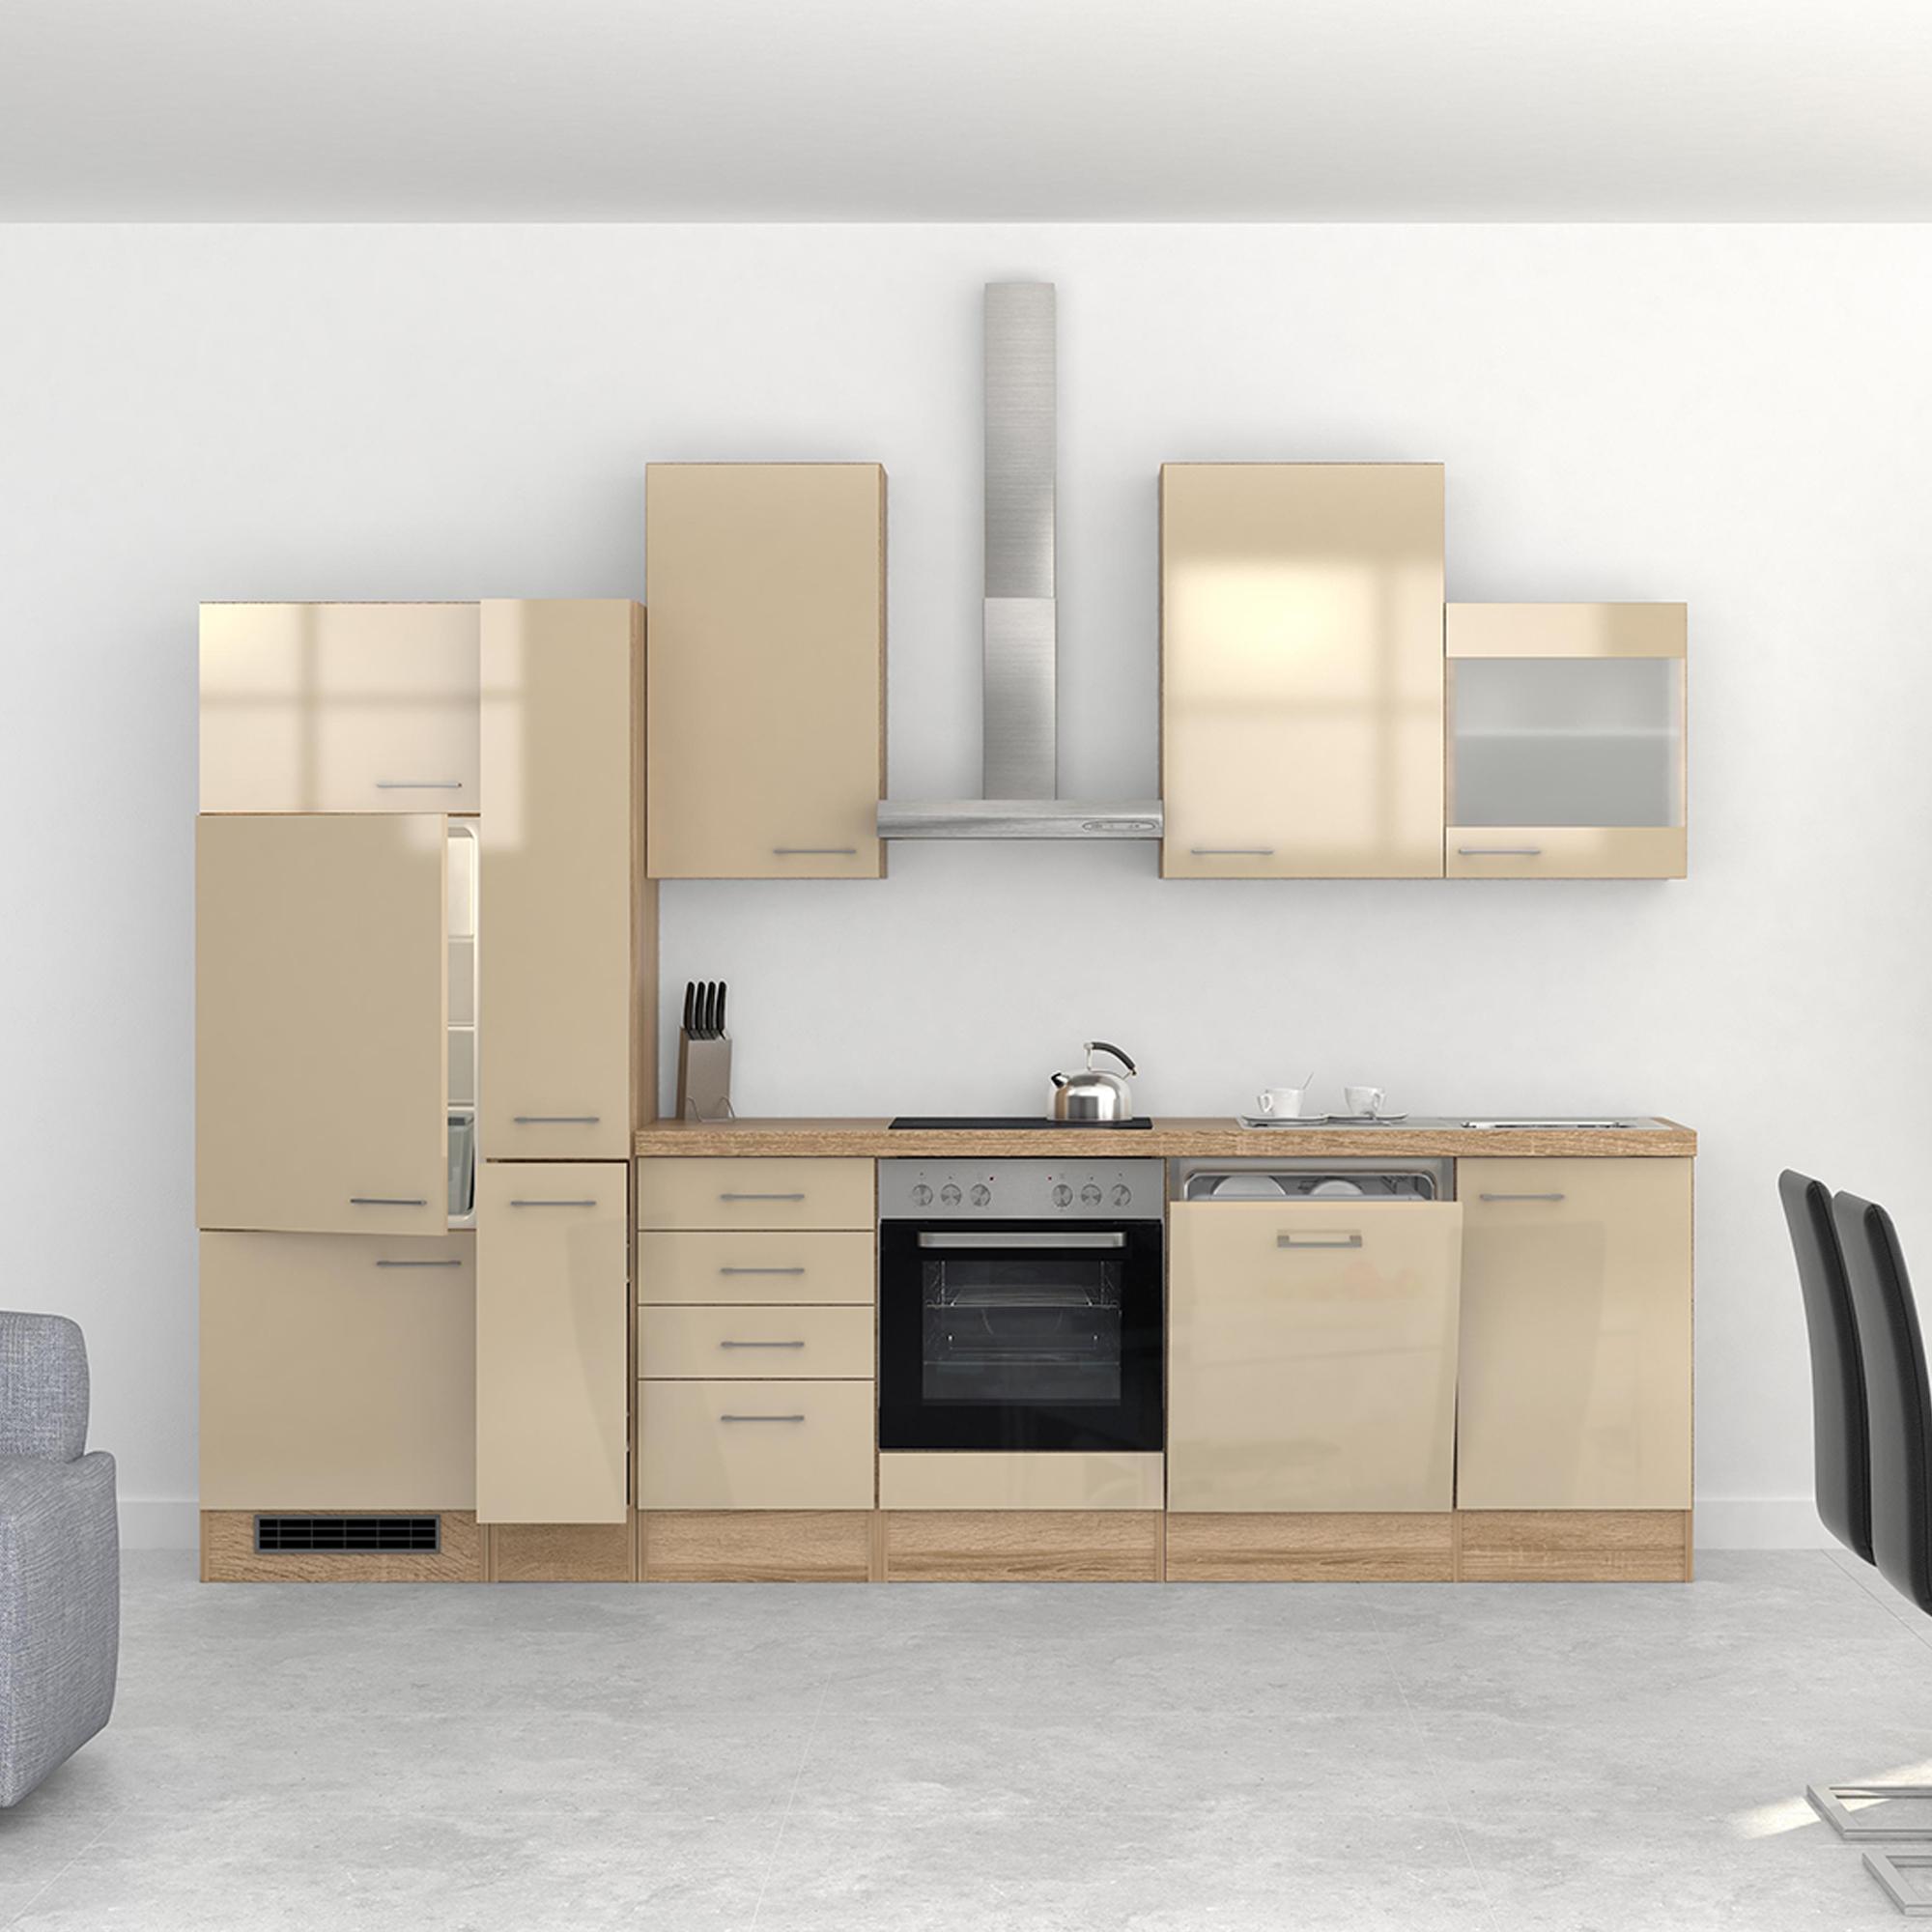 k chenzeile nepal e ger te 1 glash nger 15 teilig breite 310 cm creme k che k chenzeilen. Black Bedroom Furniture Sets. Home Design Ideas